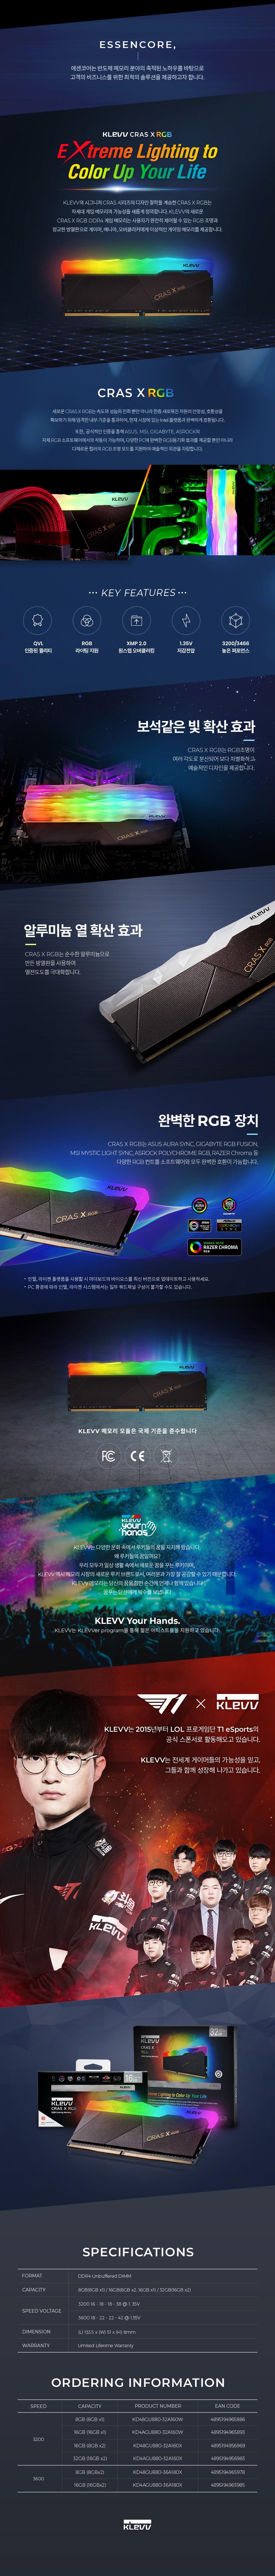 ESSENCORE KLEVV DDR4-3200 CL16 CRAS X RGB (8GB)